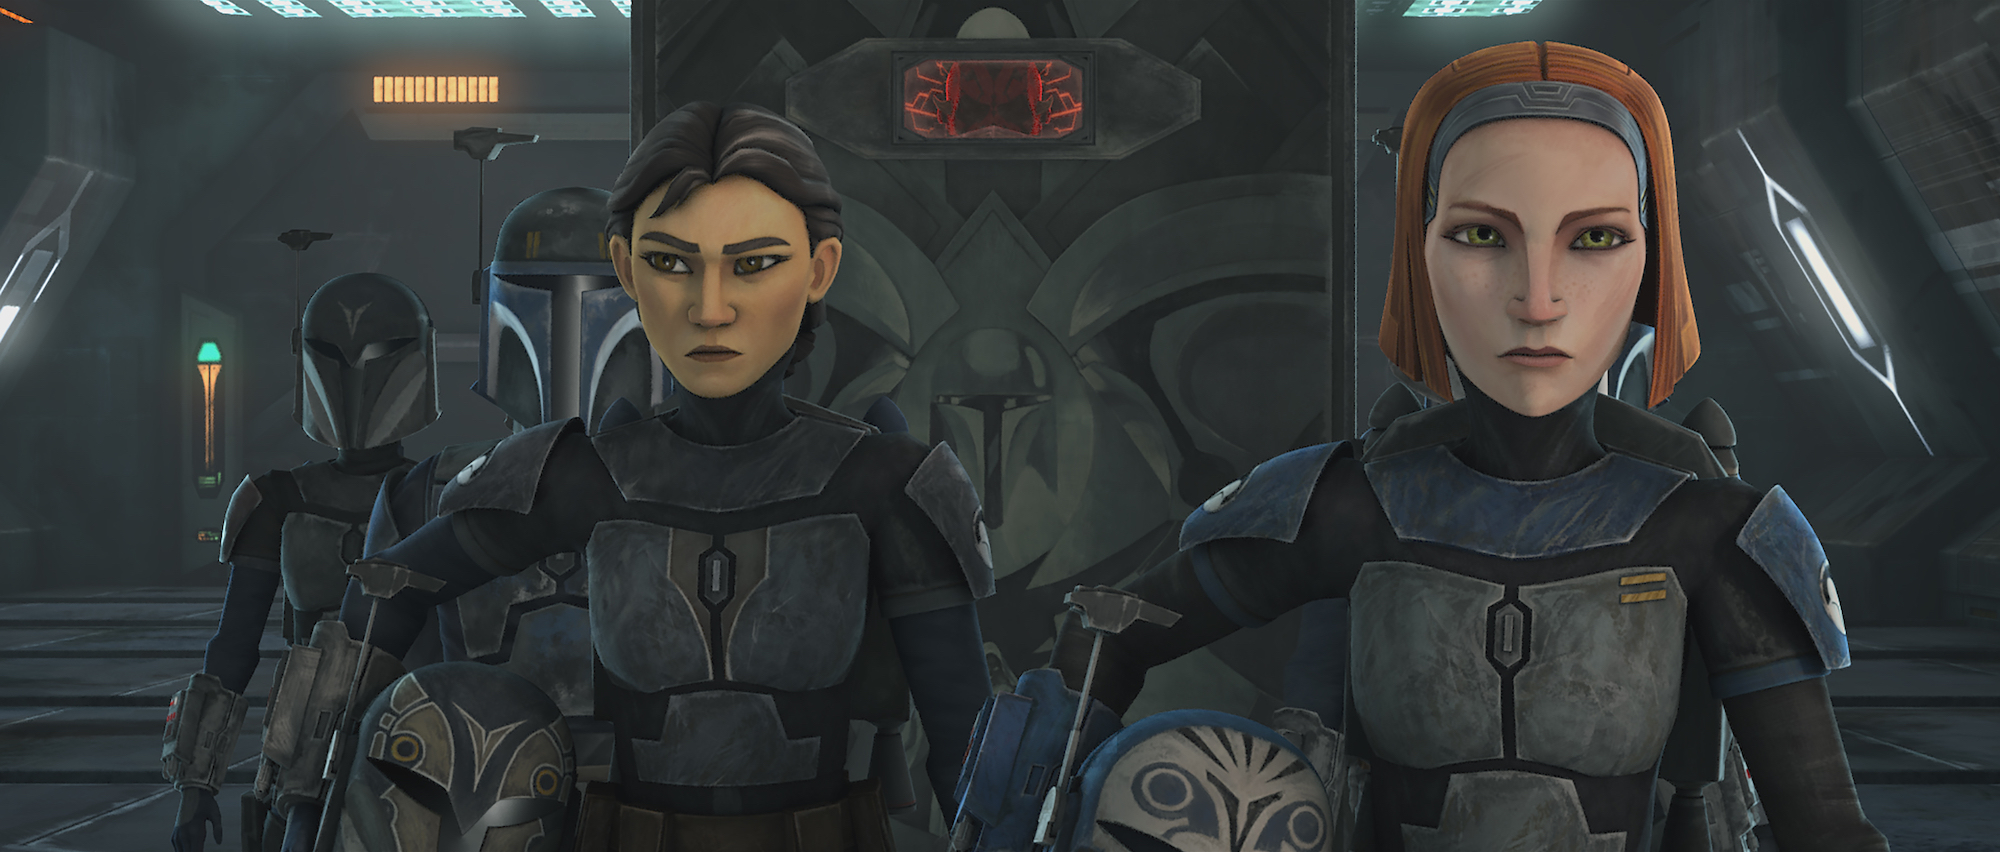 Ursa Wren (Sabine Wren's mother) and Bo-Katan during the Clone Wars in 'The Clone Wars'